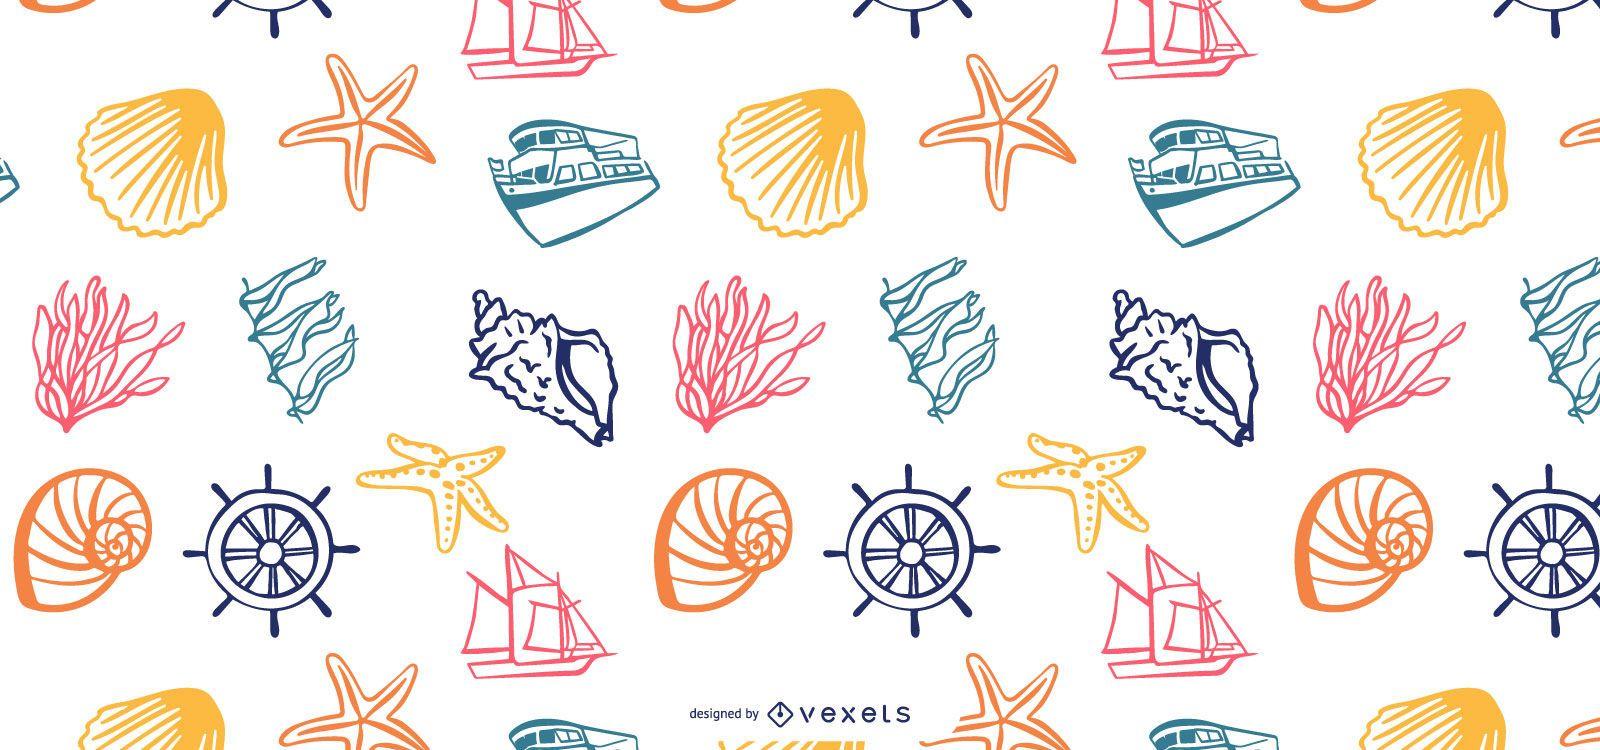 Sea elements pattern design